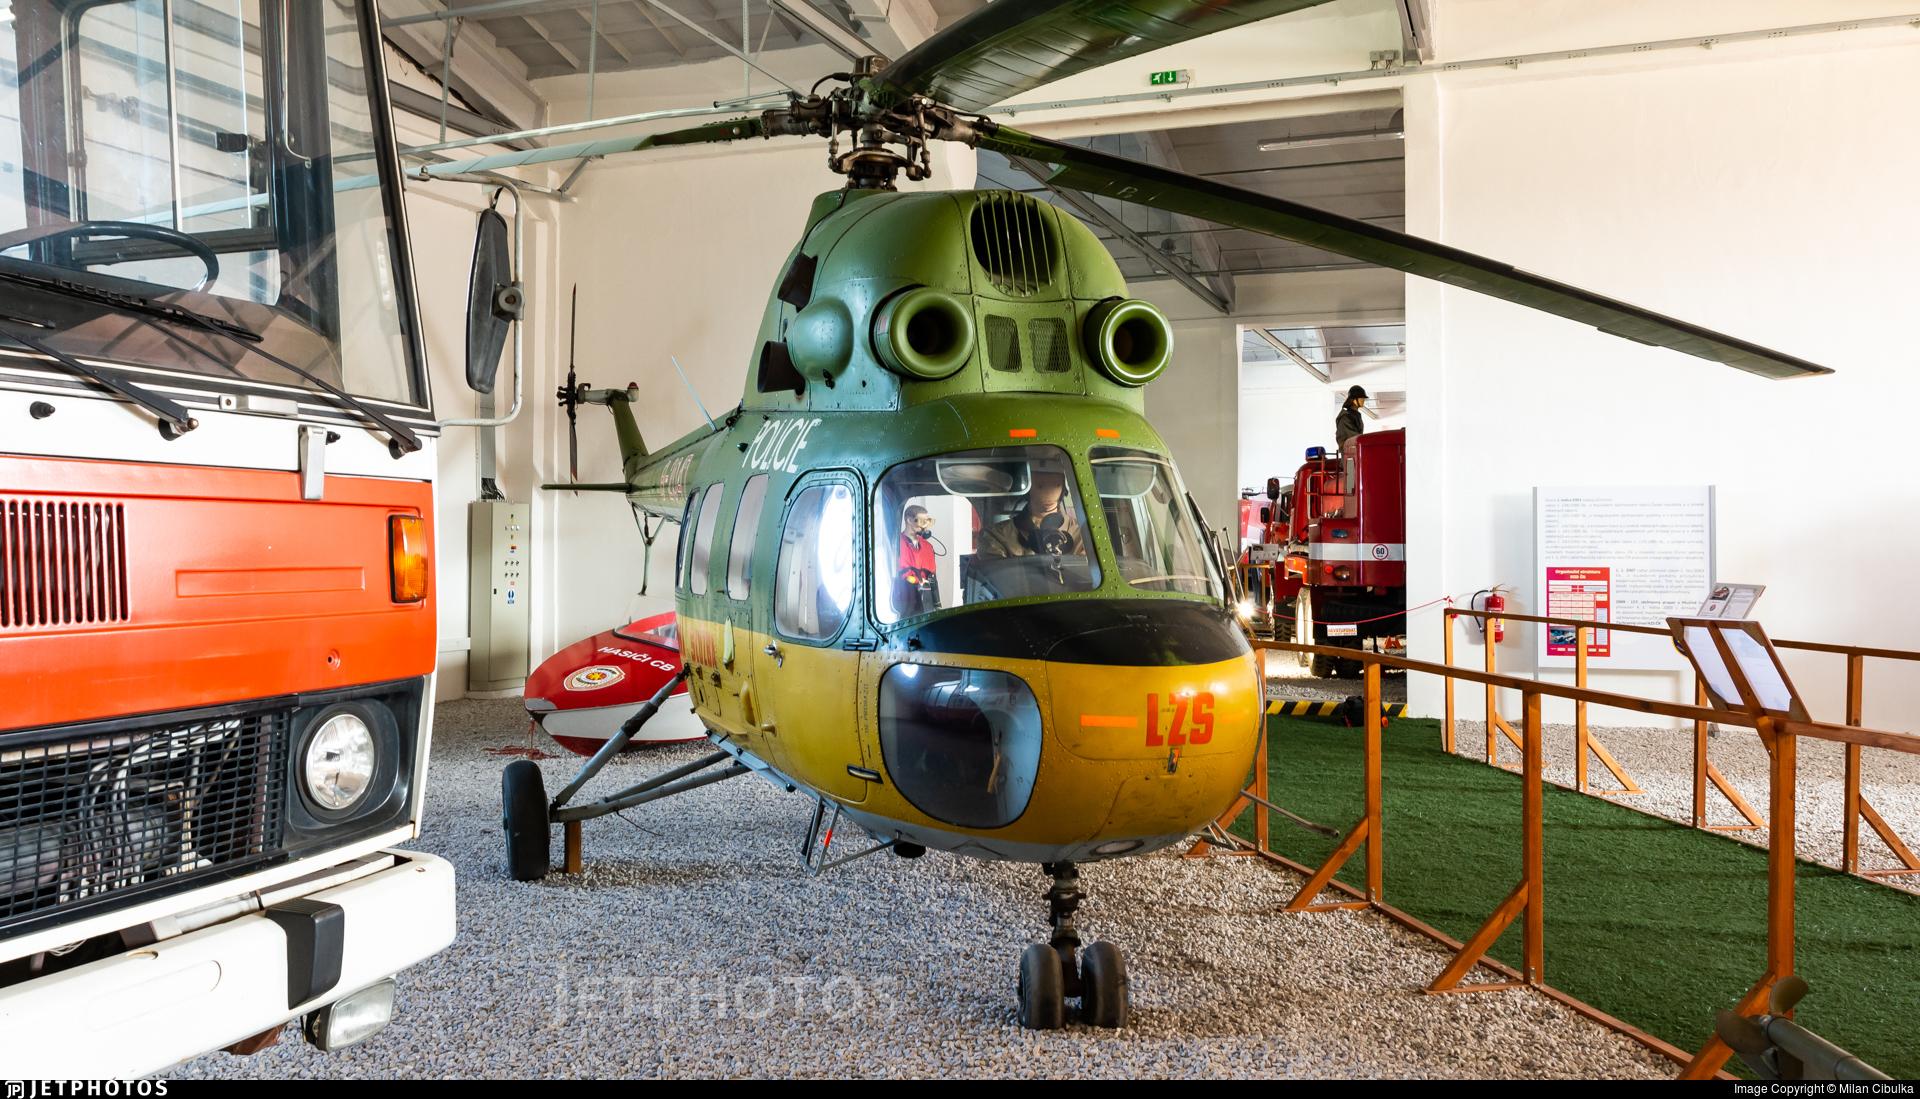 B-2047 - PZL-Swidnik Mi-2 Hoplite - Czech Republic - Police